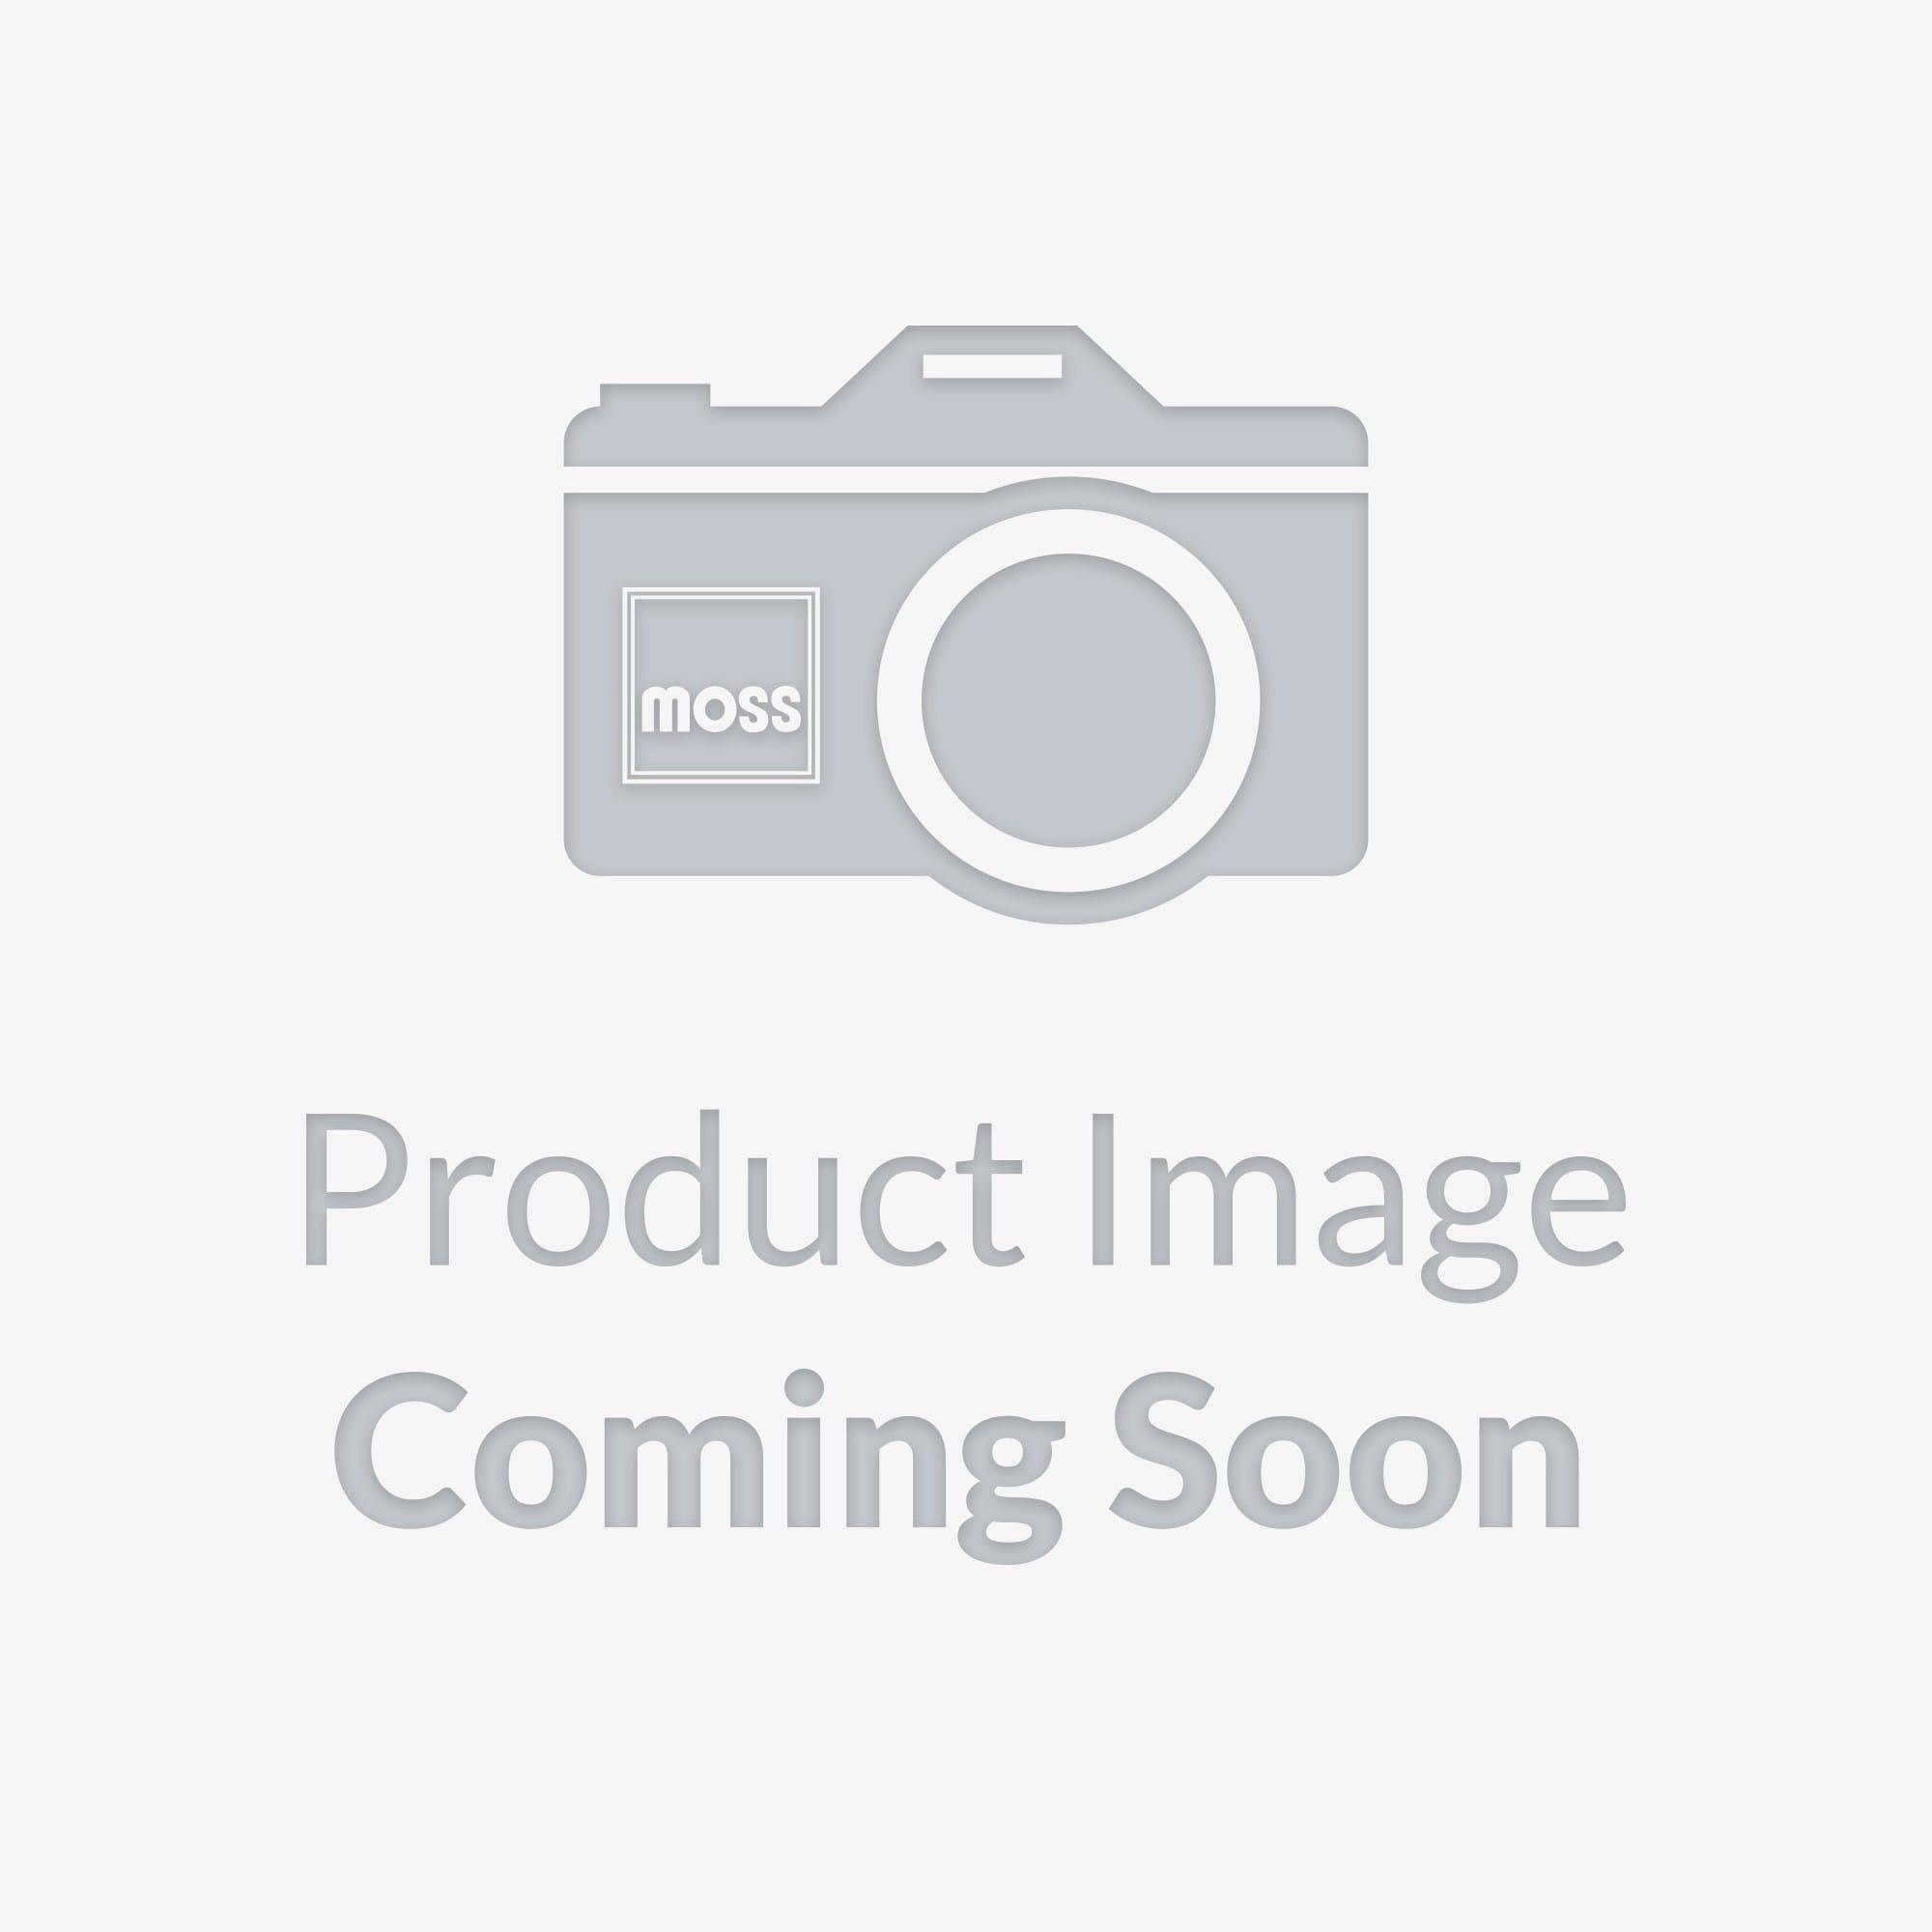 156 878 P700 Tripod Headlight Set Moss Motors